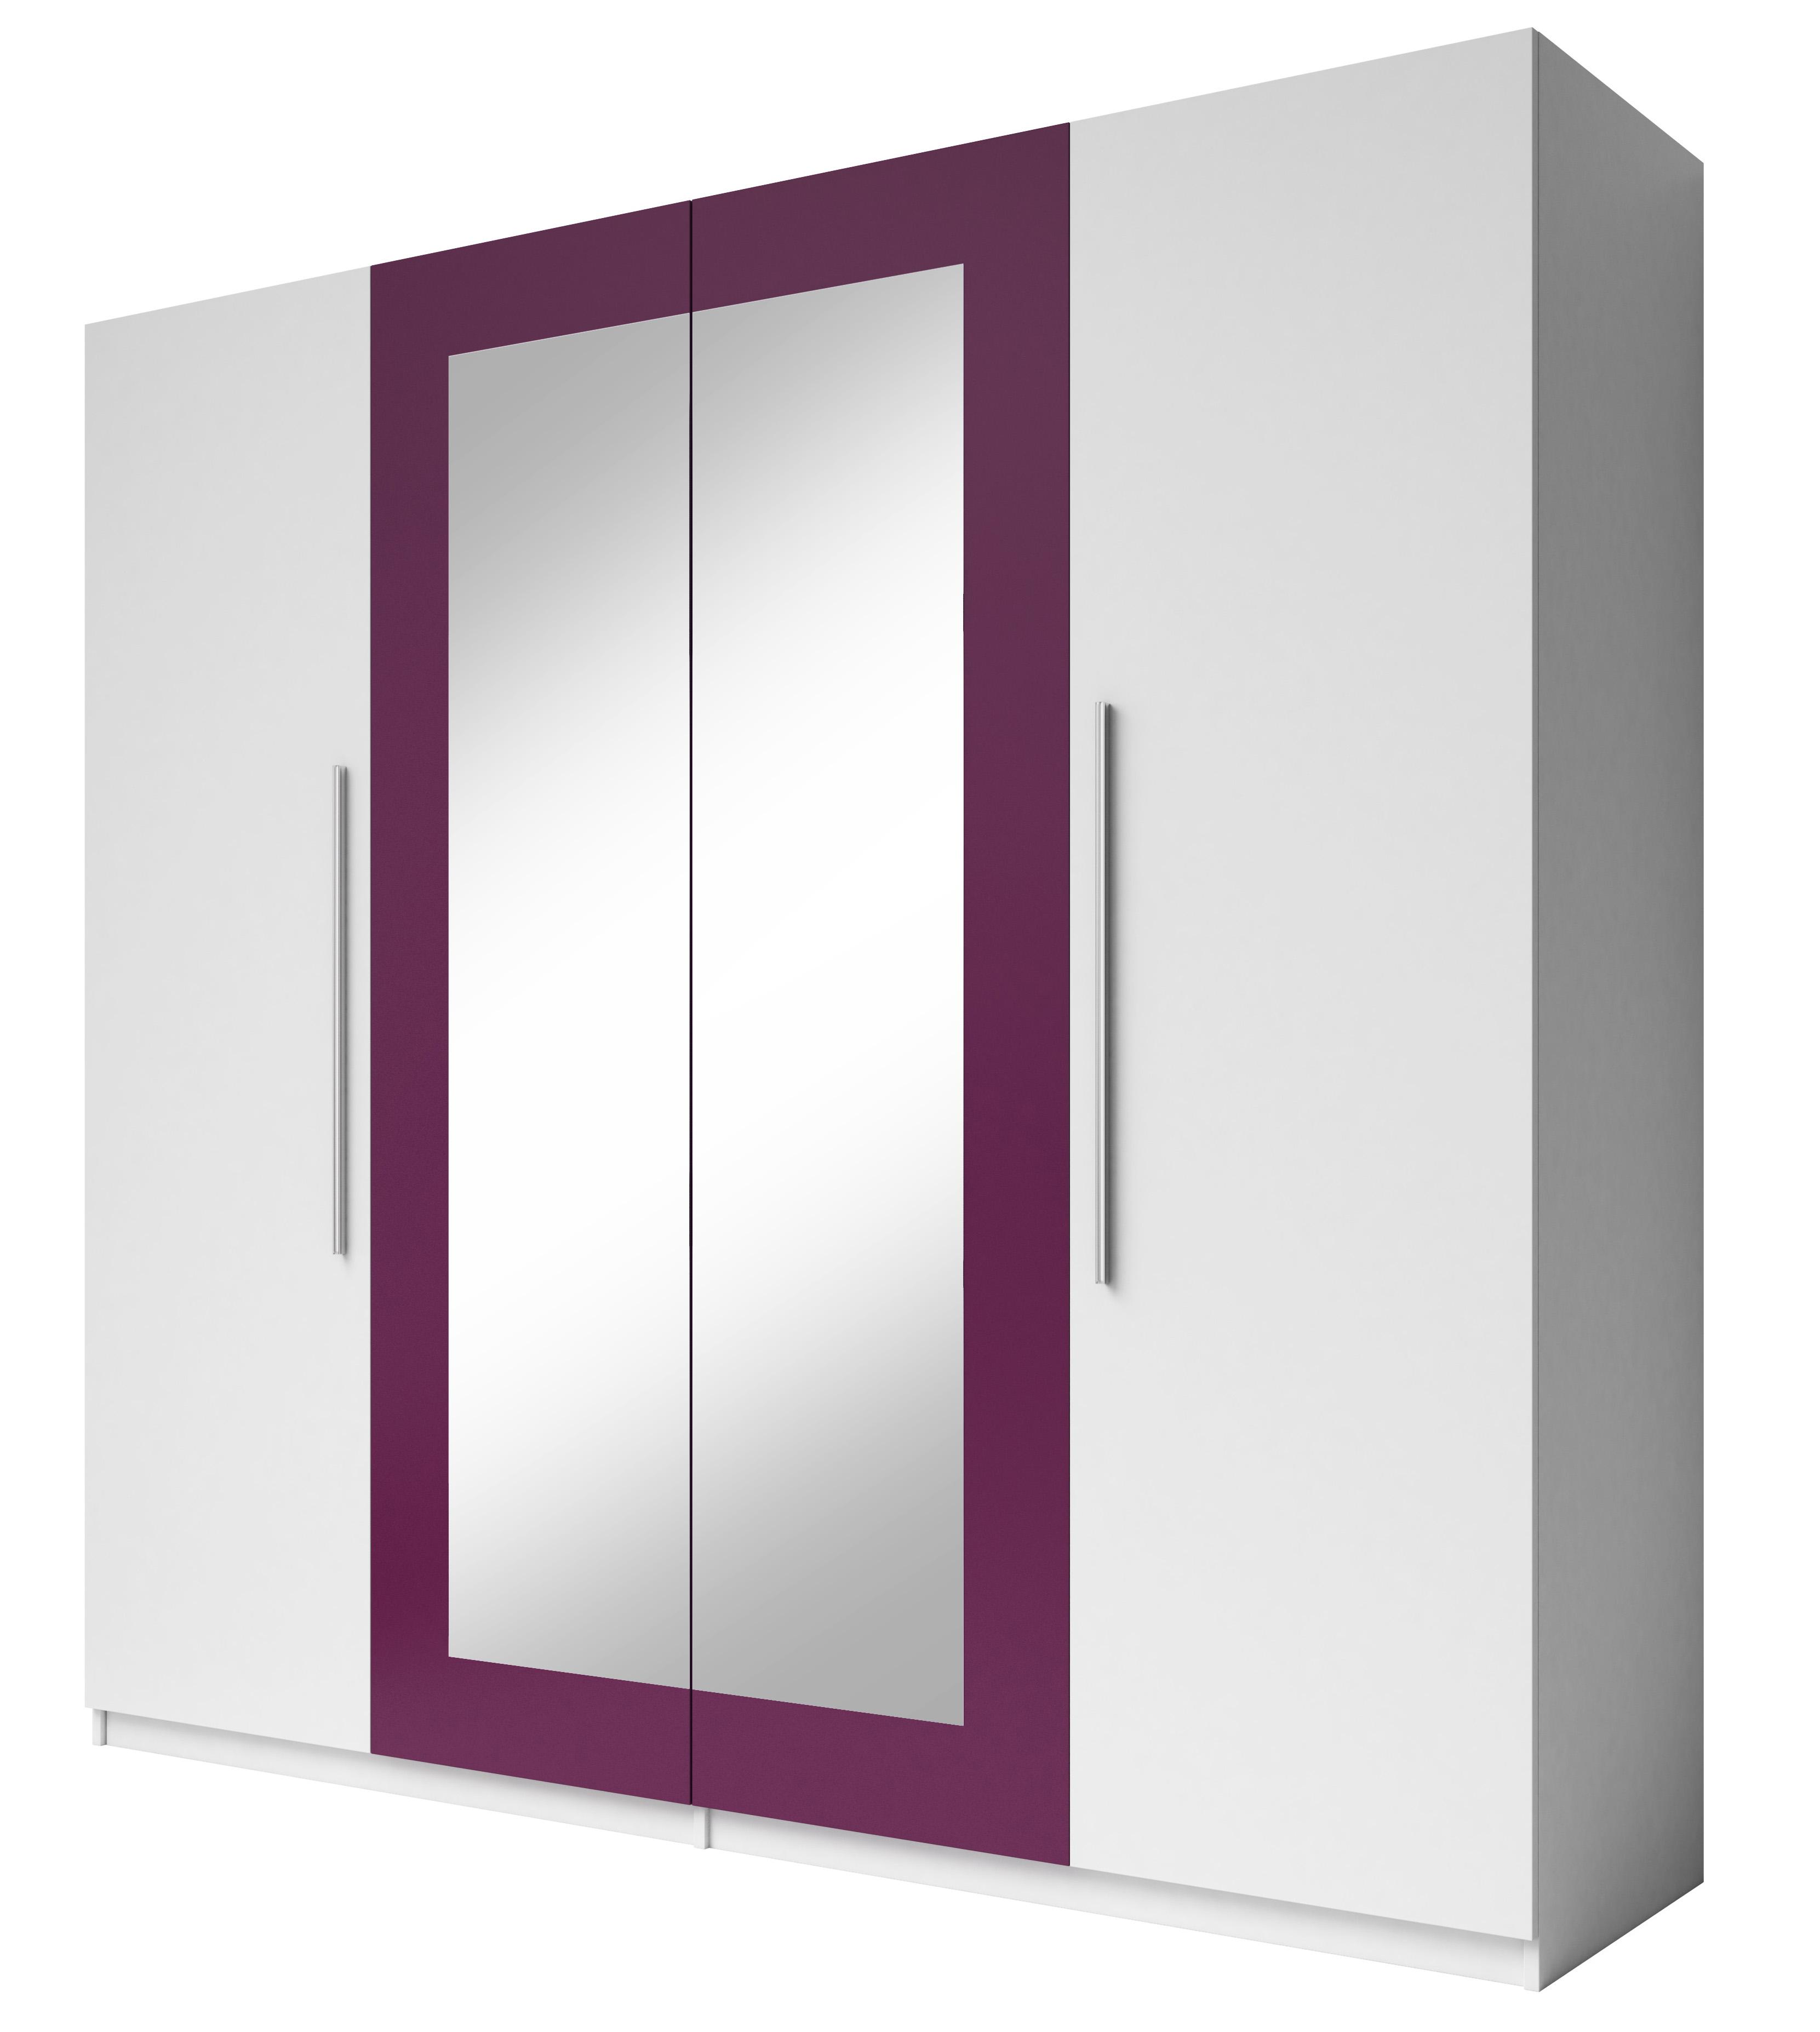 Šatní skříň - Verwood - Typ 20 (bílá + fialová)